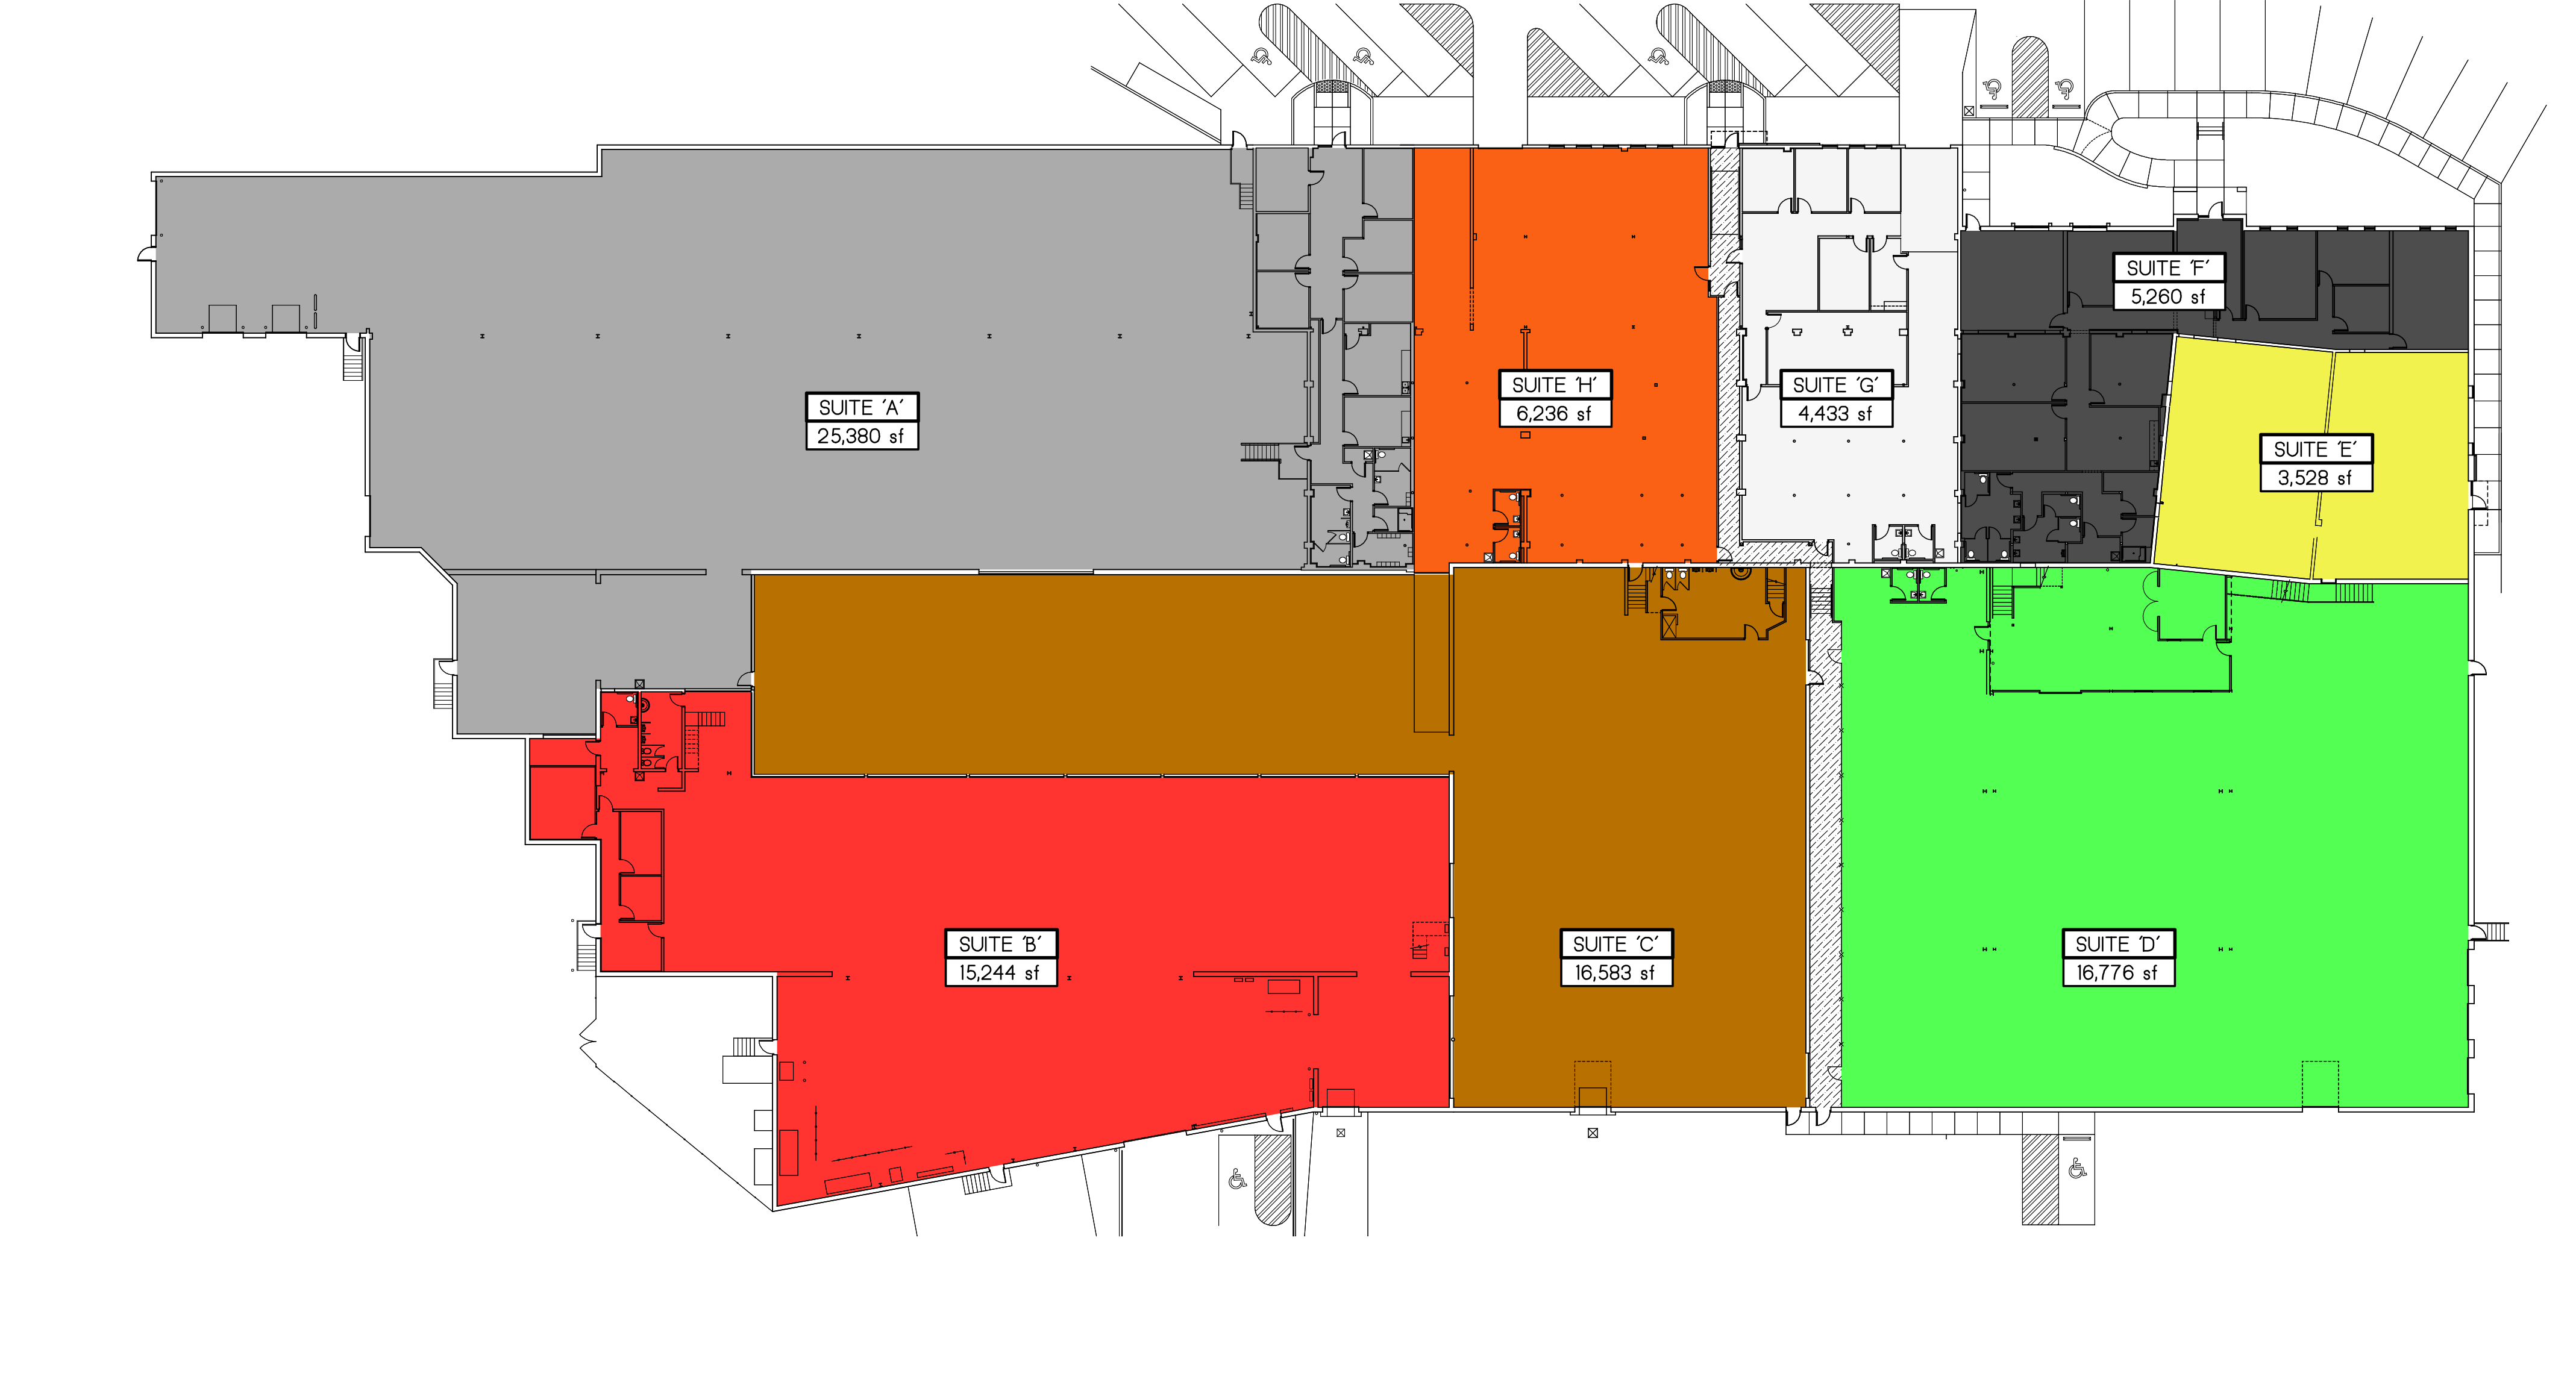 Whole complex floorplan